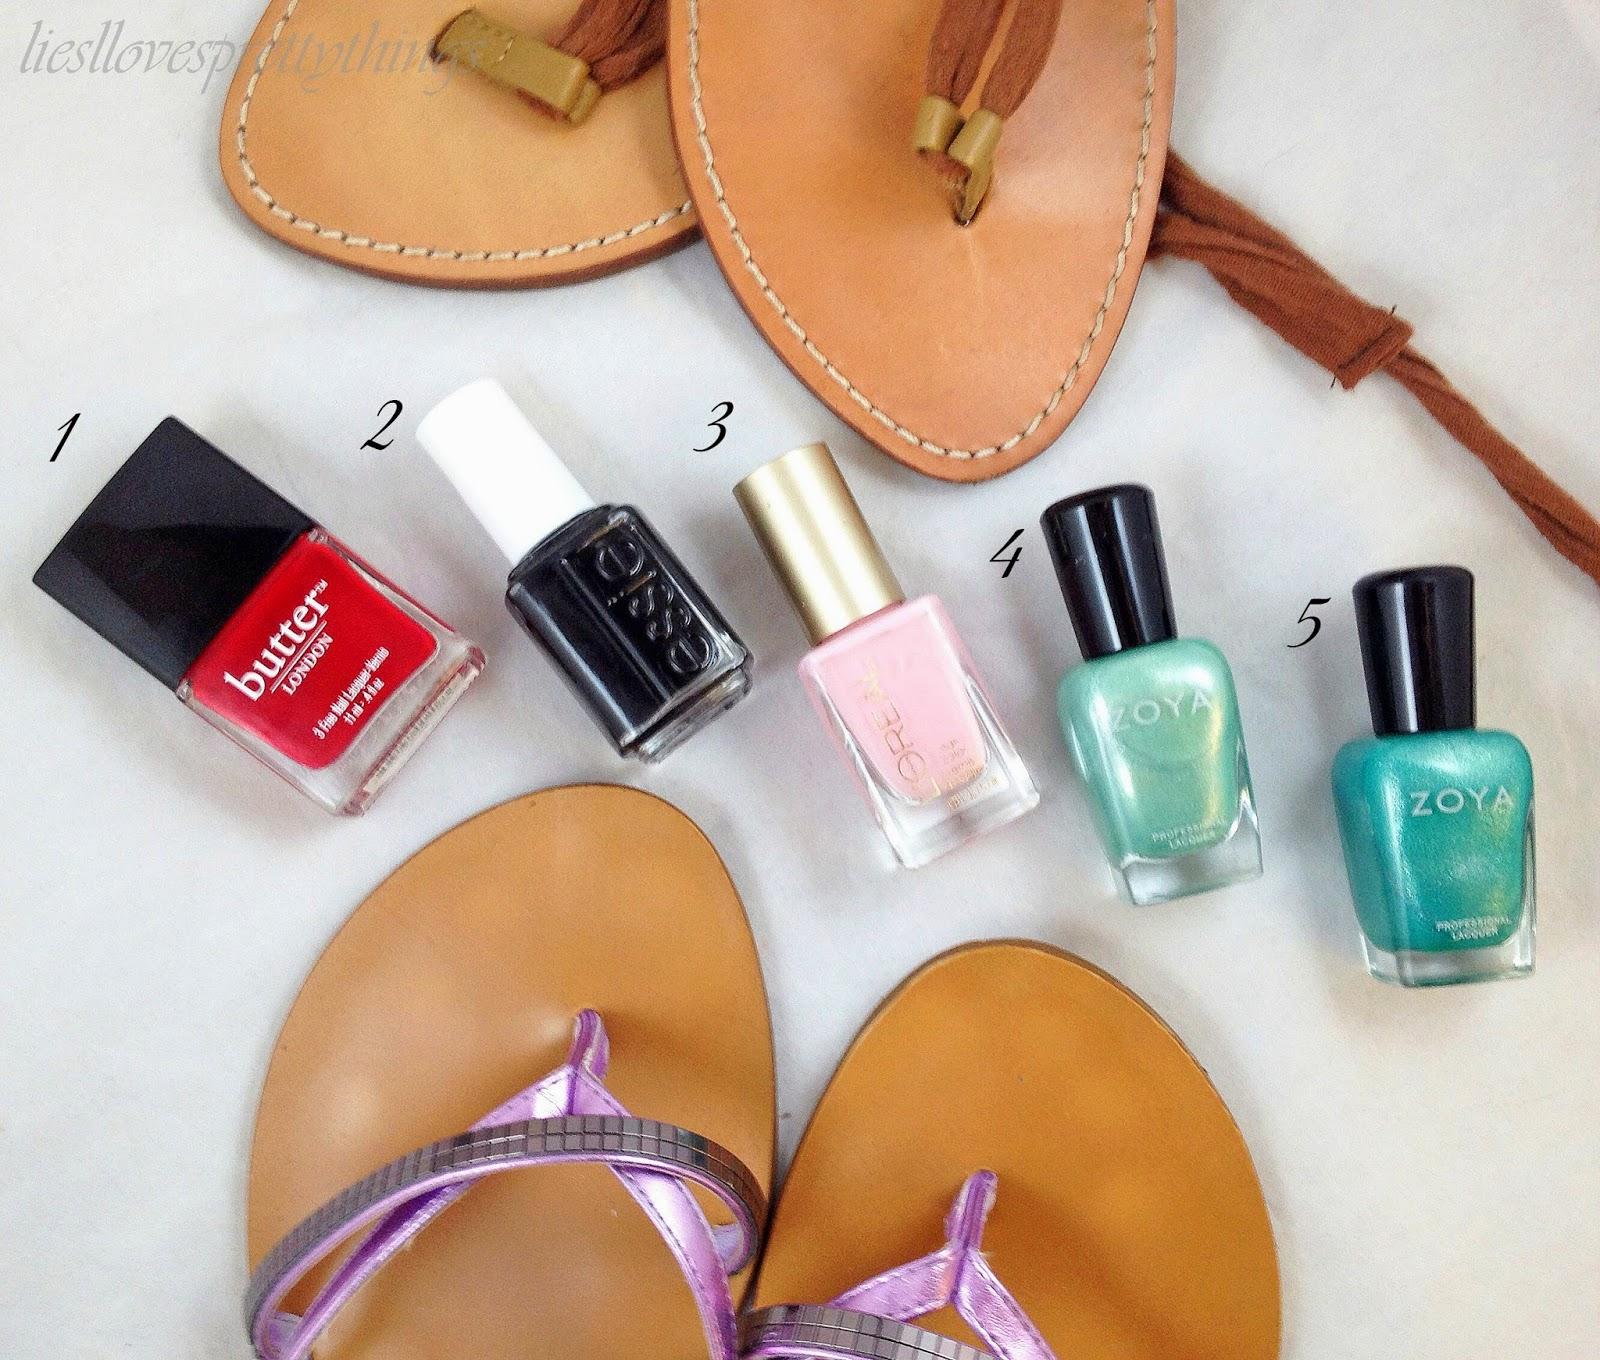 Liesl Loves Pretty Things: My Favorite Summer Pedicure Colors